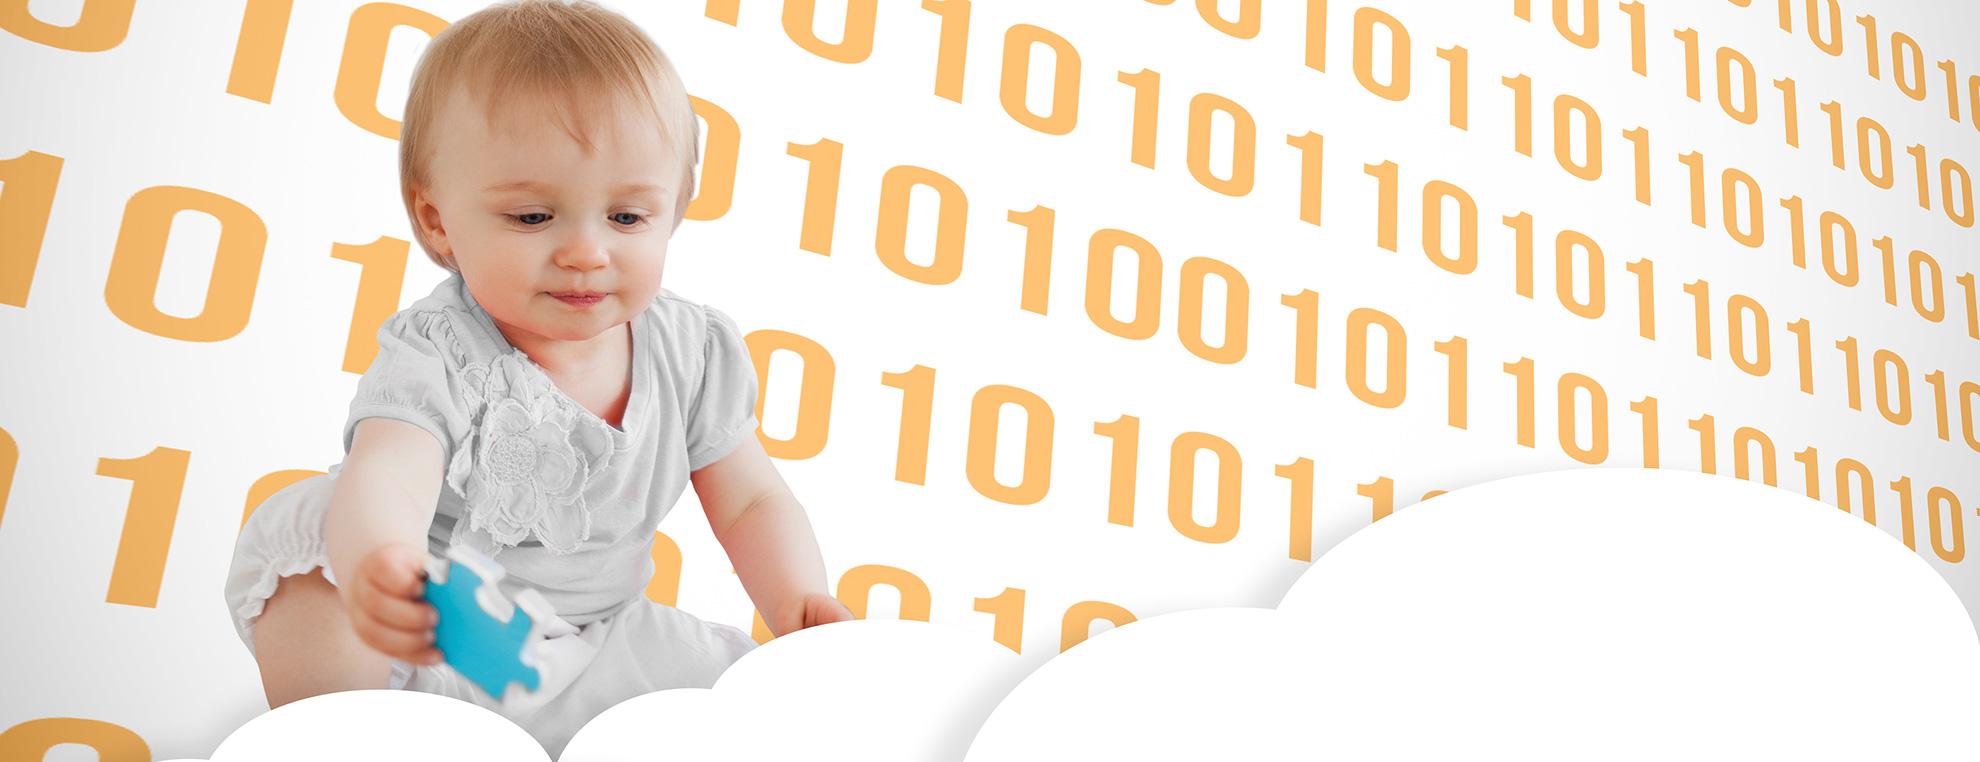 Un niño con un fondo binario